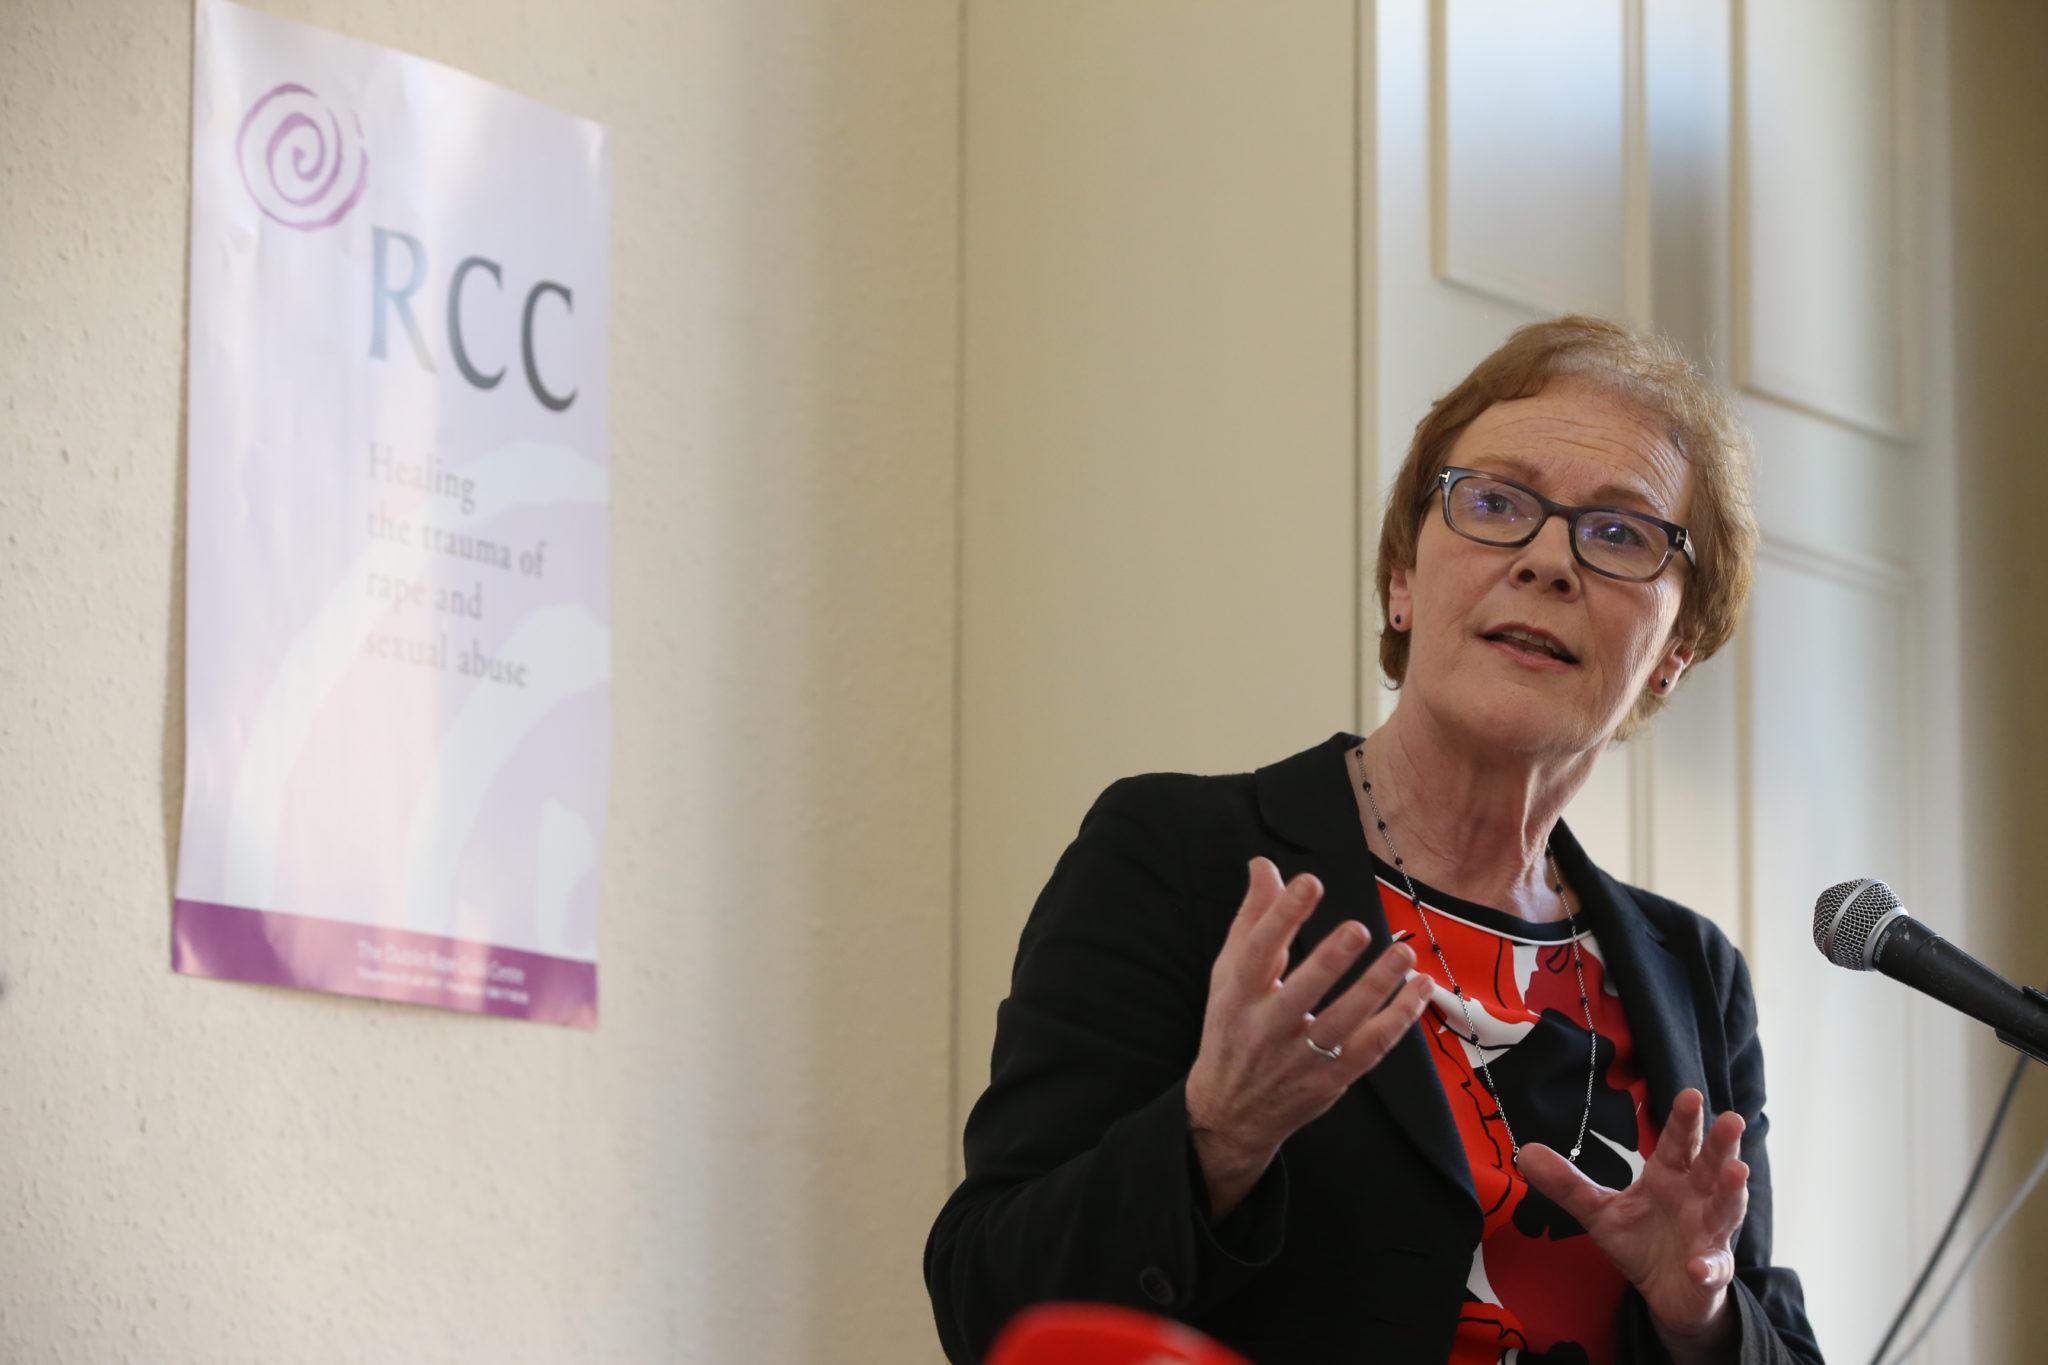 Dublin Rape Crisis Centre CEO Noeline Blackwell